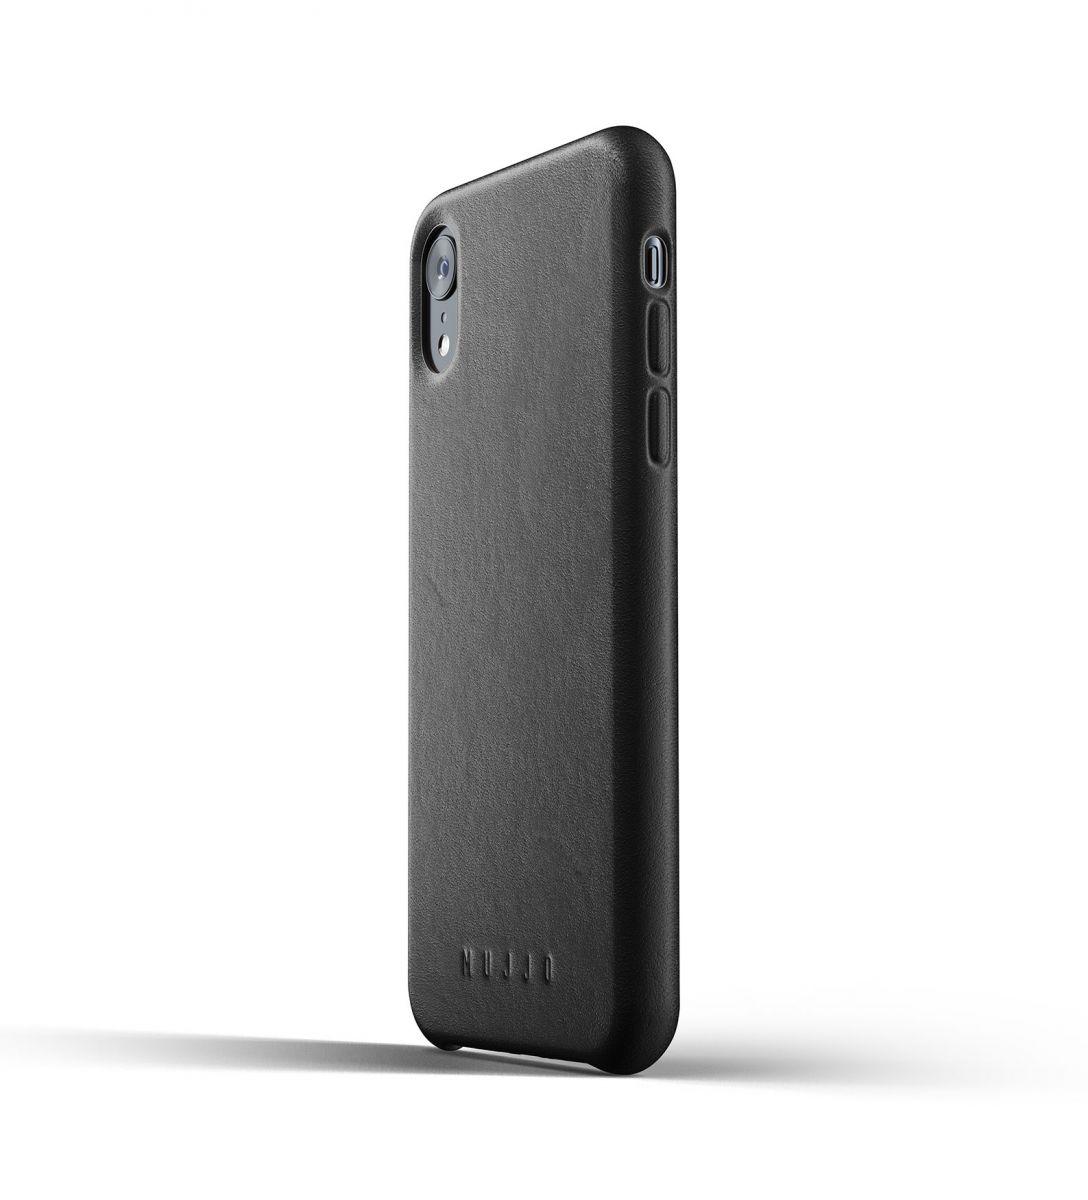 Kaitseümbris Apple iPhone XR, naturaalsest nahast, must, Mujjo « Avaleht - Tooted   Kännukas